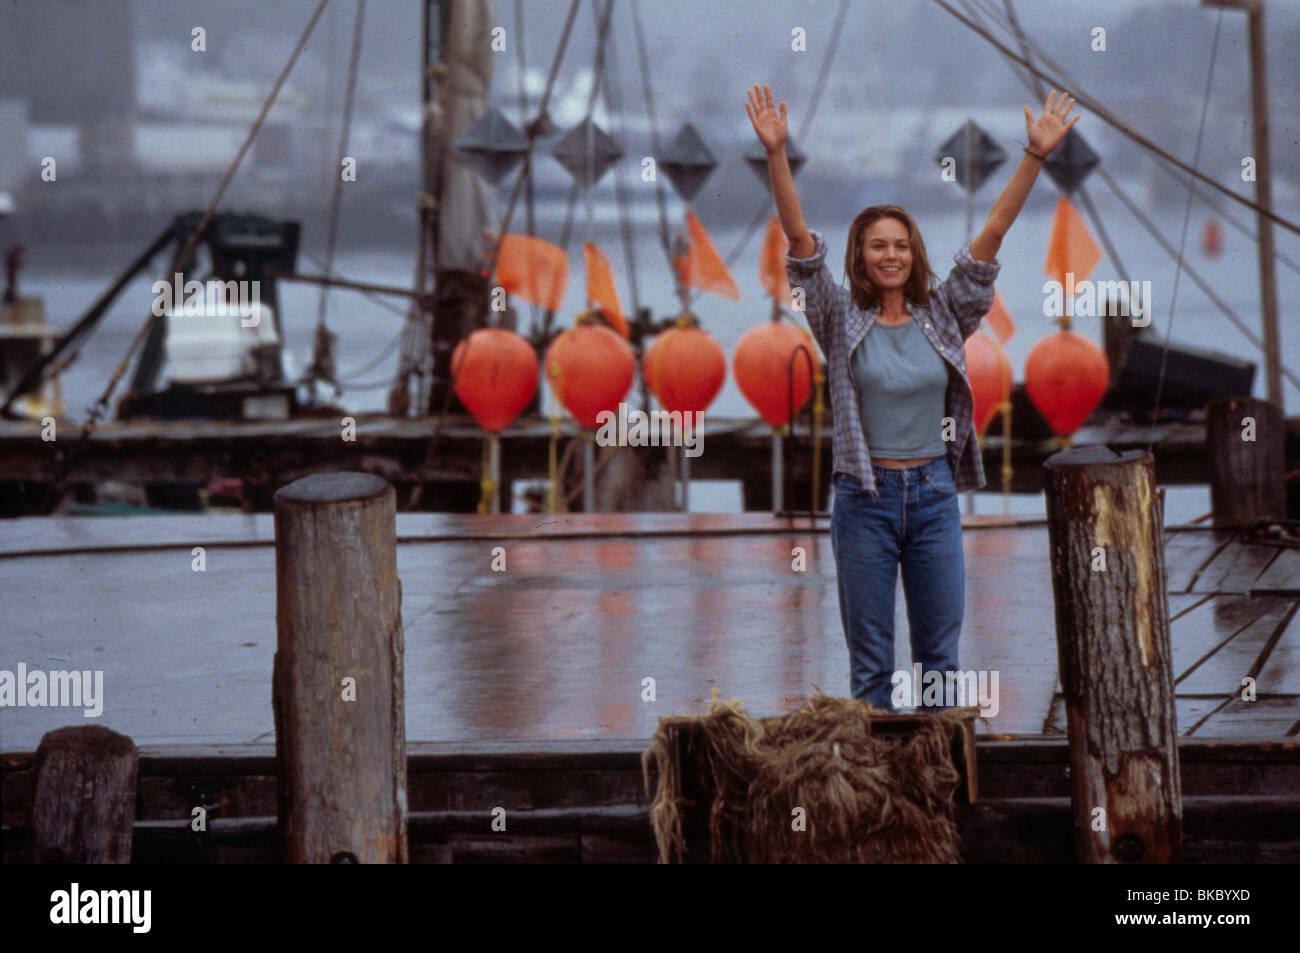 The Perfect Storm 2000 Diane Lane Psto 043 Stock Photo Alamy